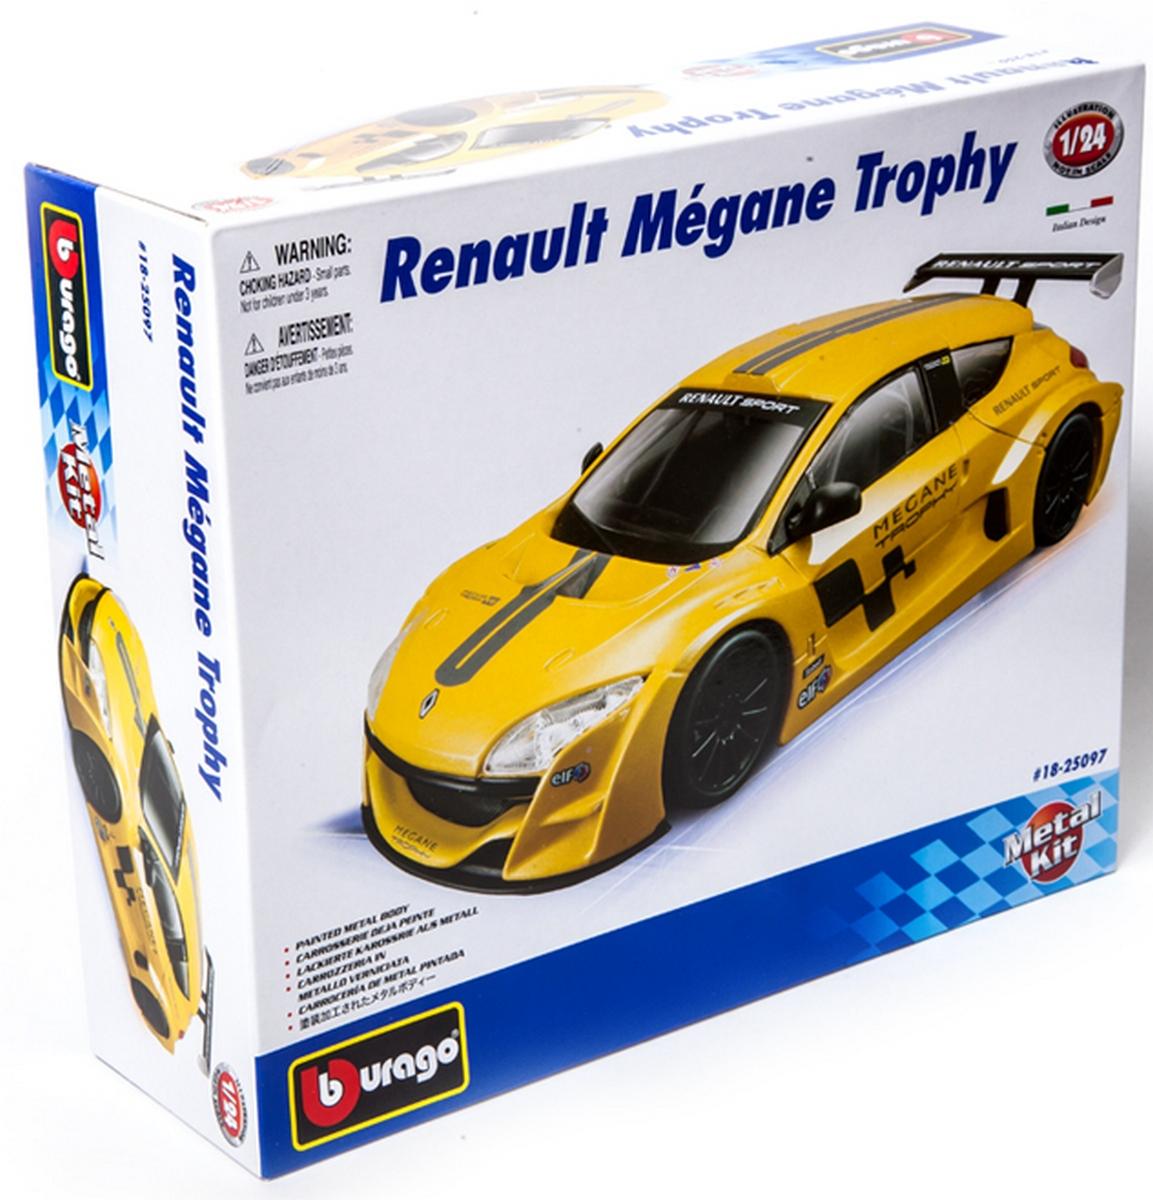 bburago Авто-конструктор «Renault Megane Trophy» 18-25097